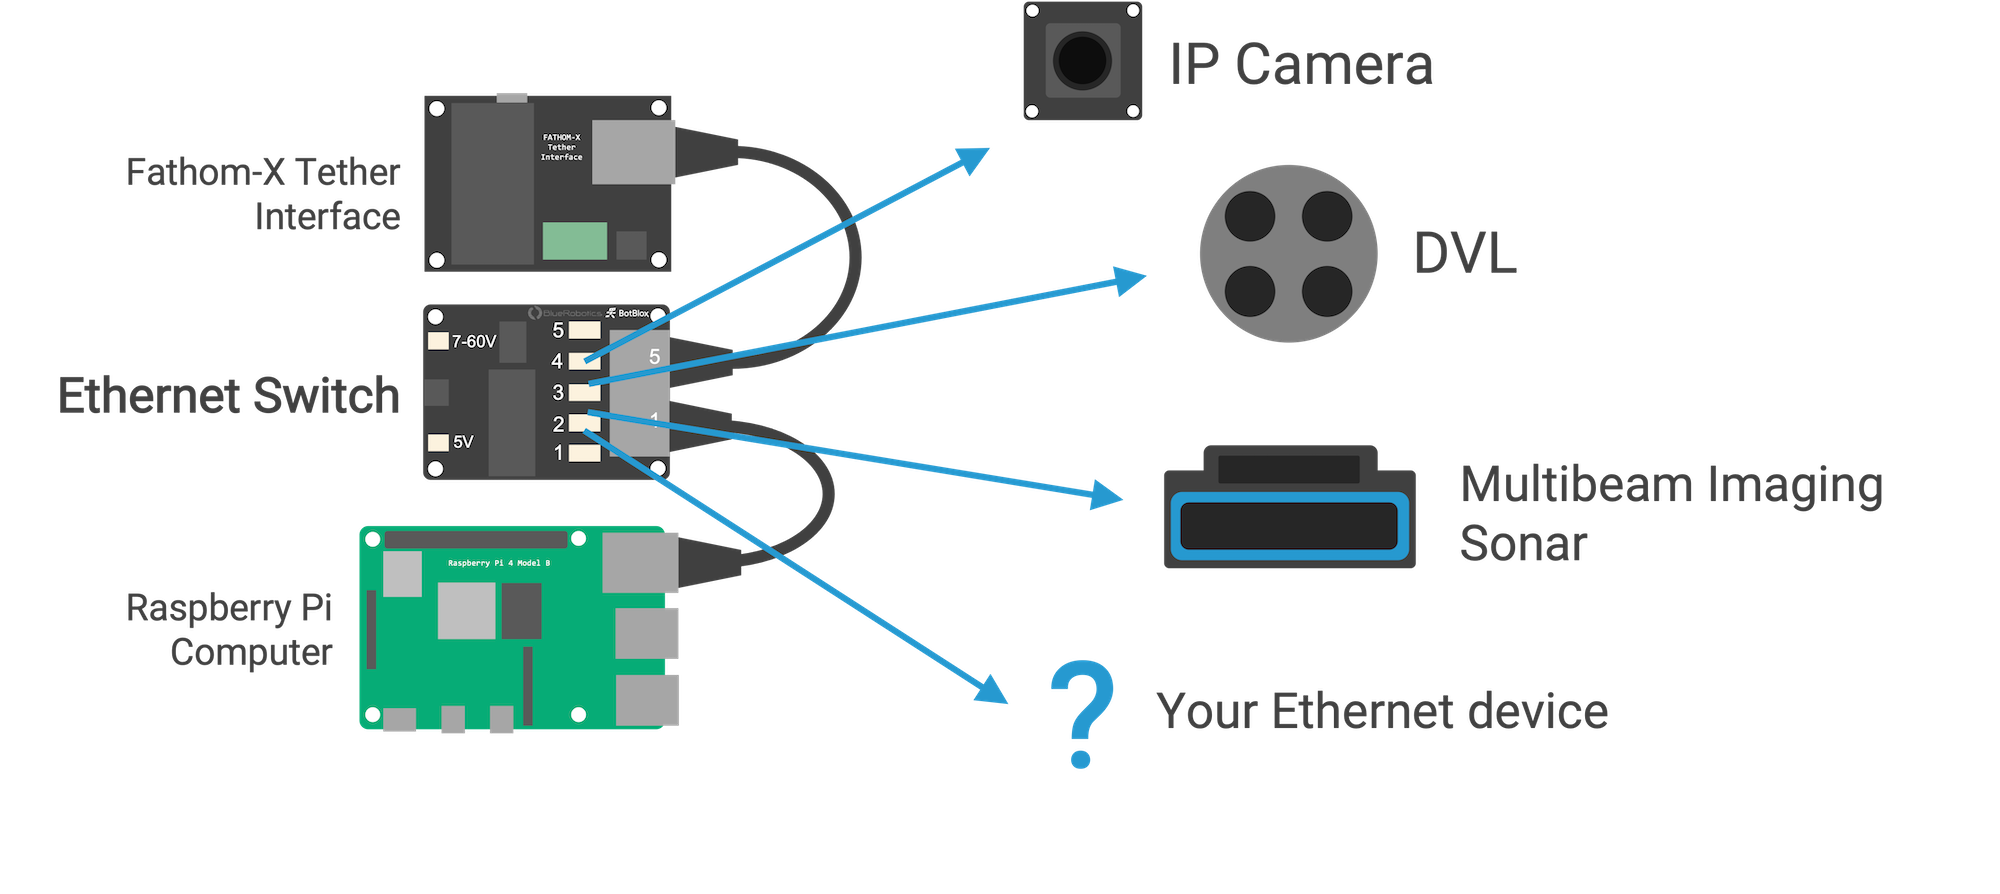 Ethernet Switch Usage Diagram on ROV